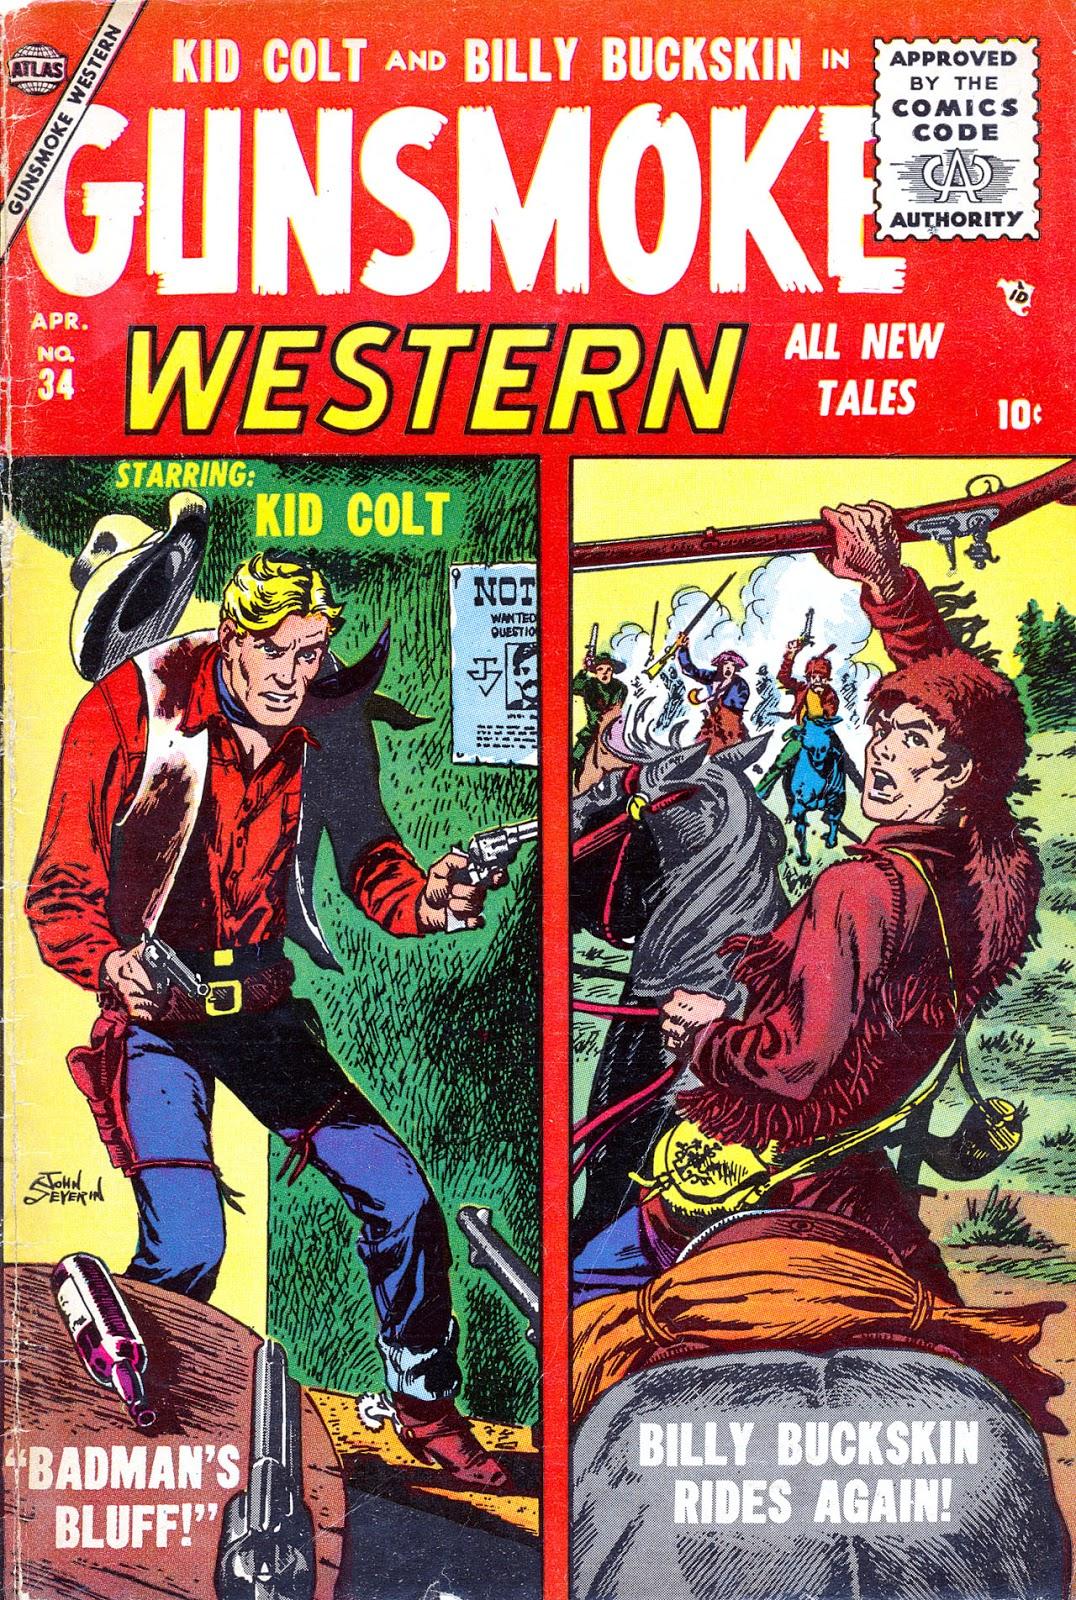 Gunsmoke Western issue 34 - Page 1